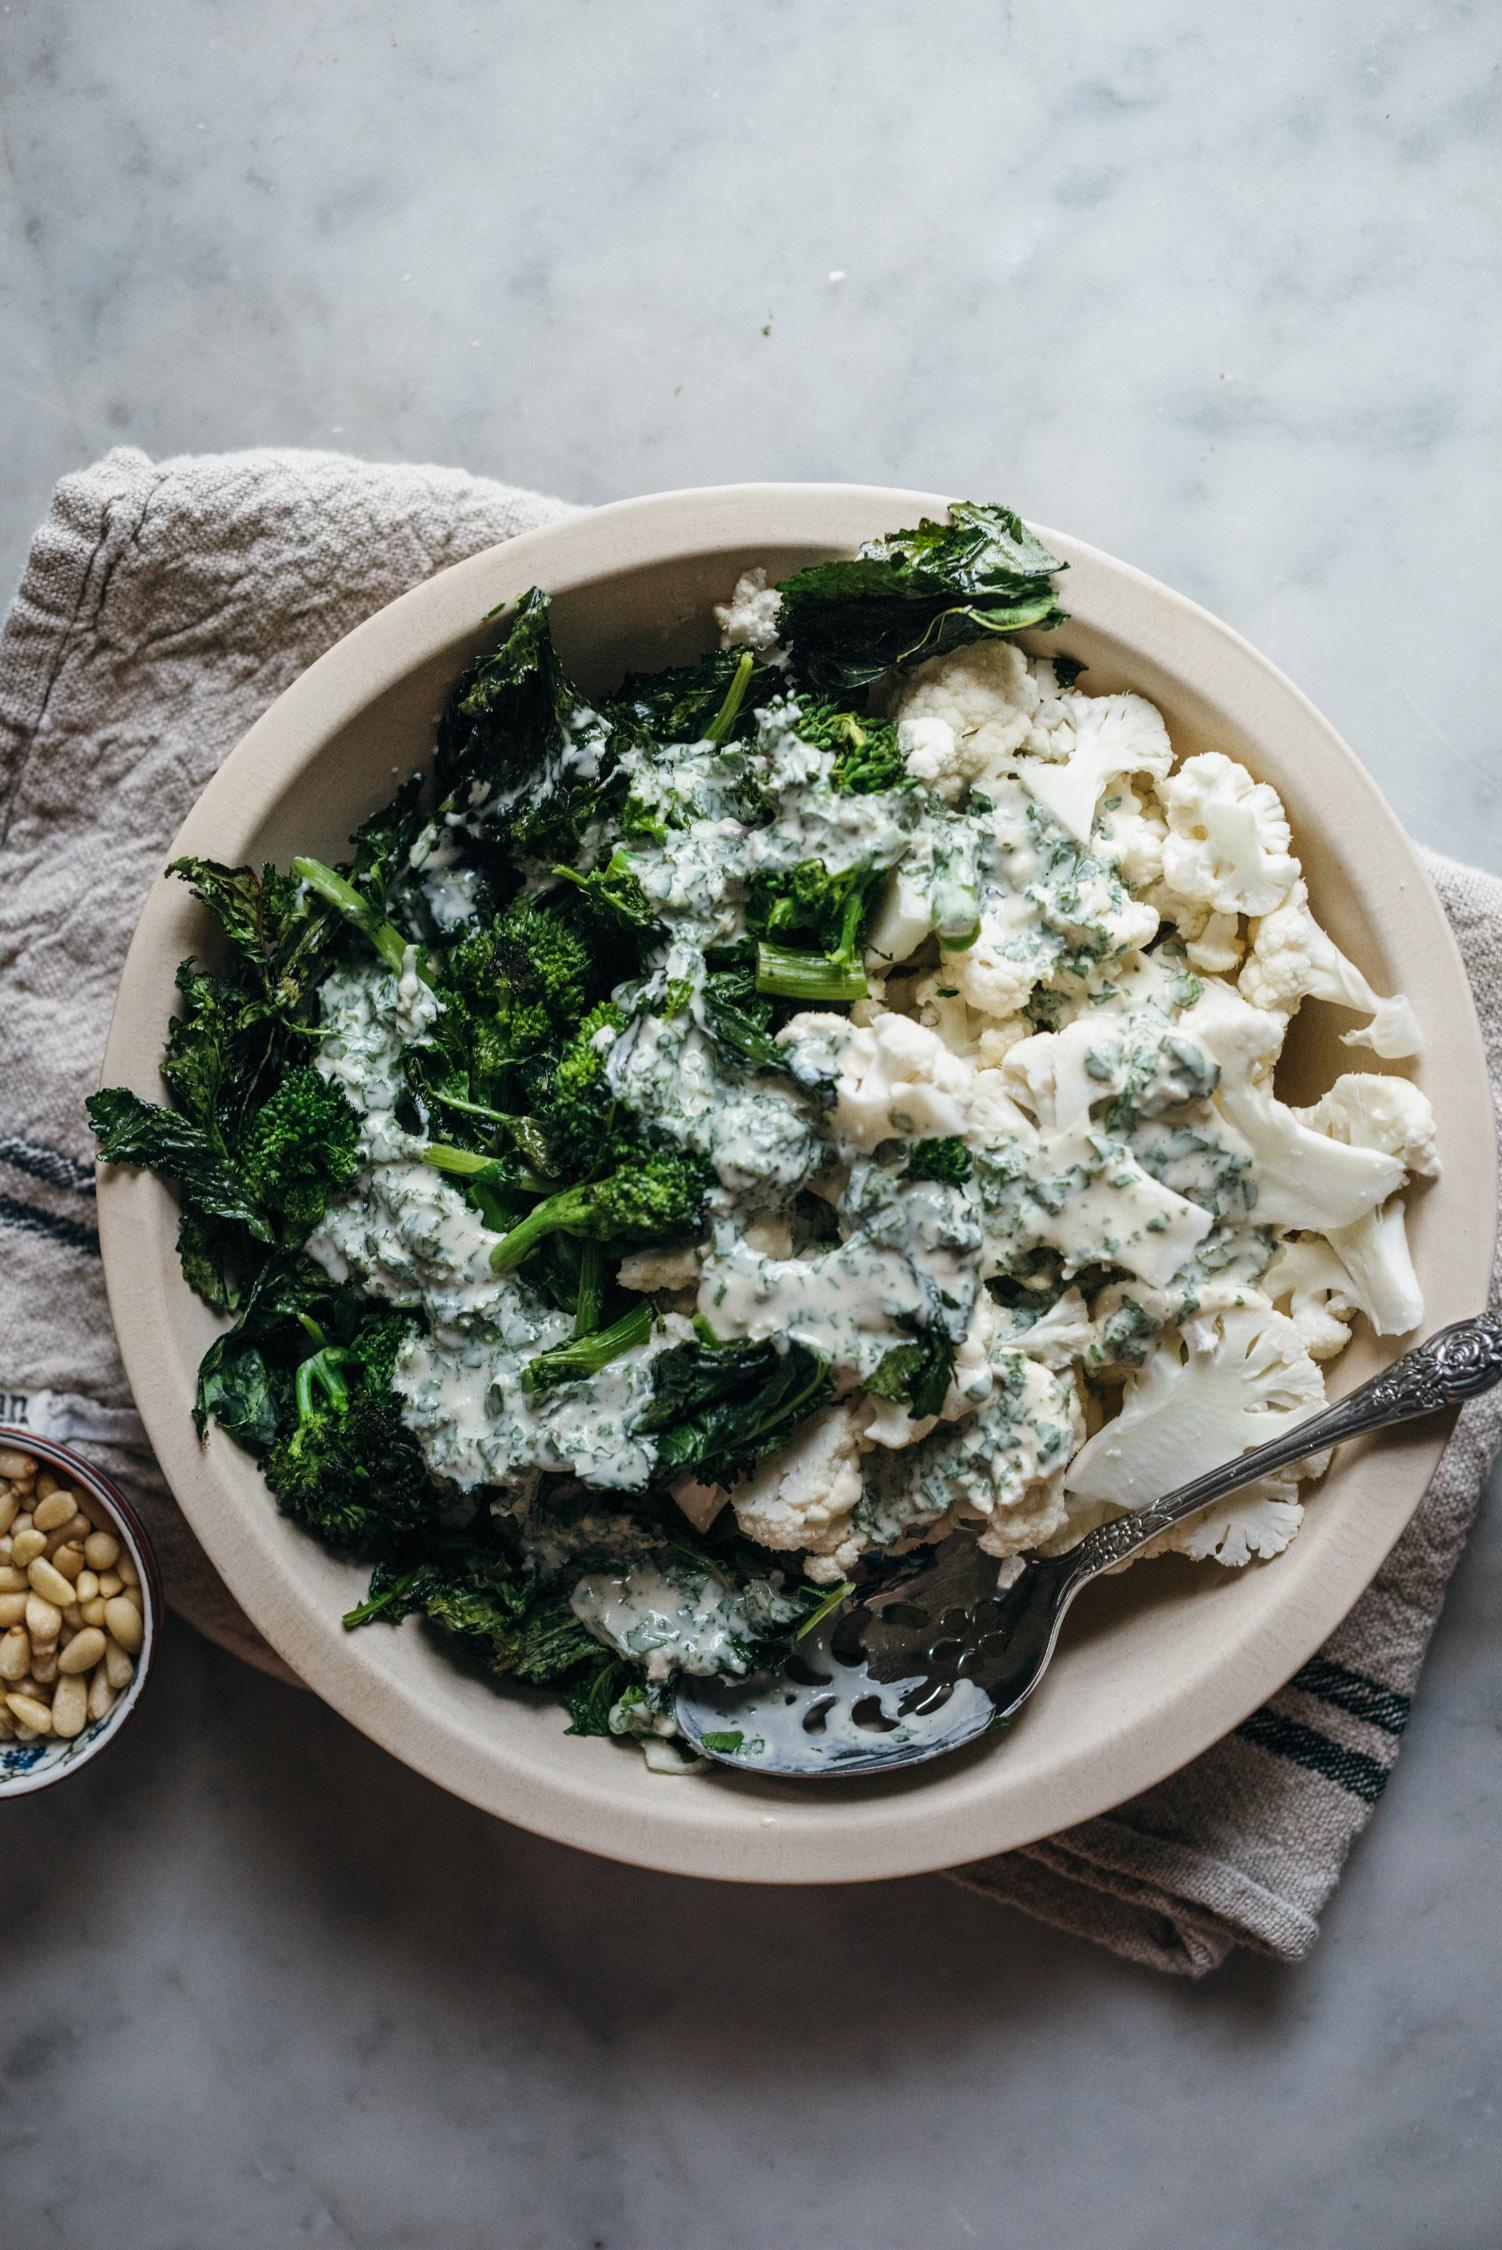 Broccoli Rabe and Crunchy Cauliflower with a Lemon Tahini Dressing